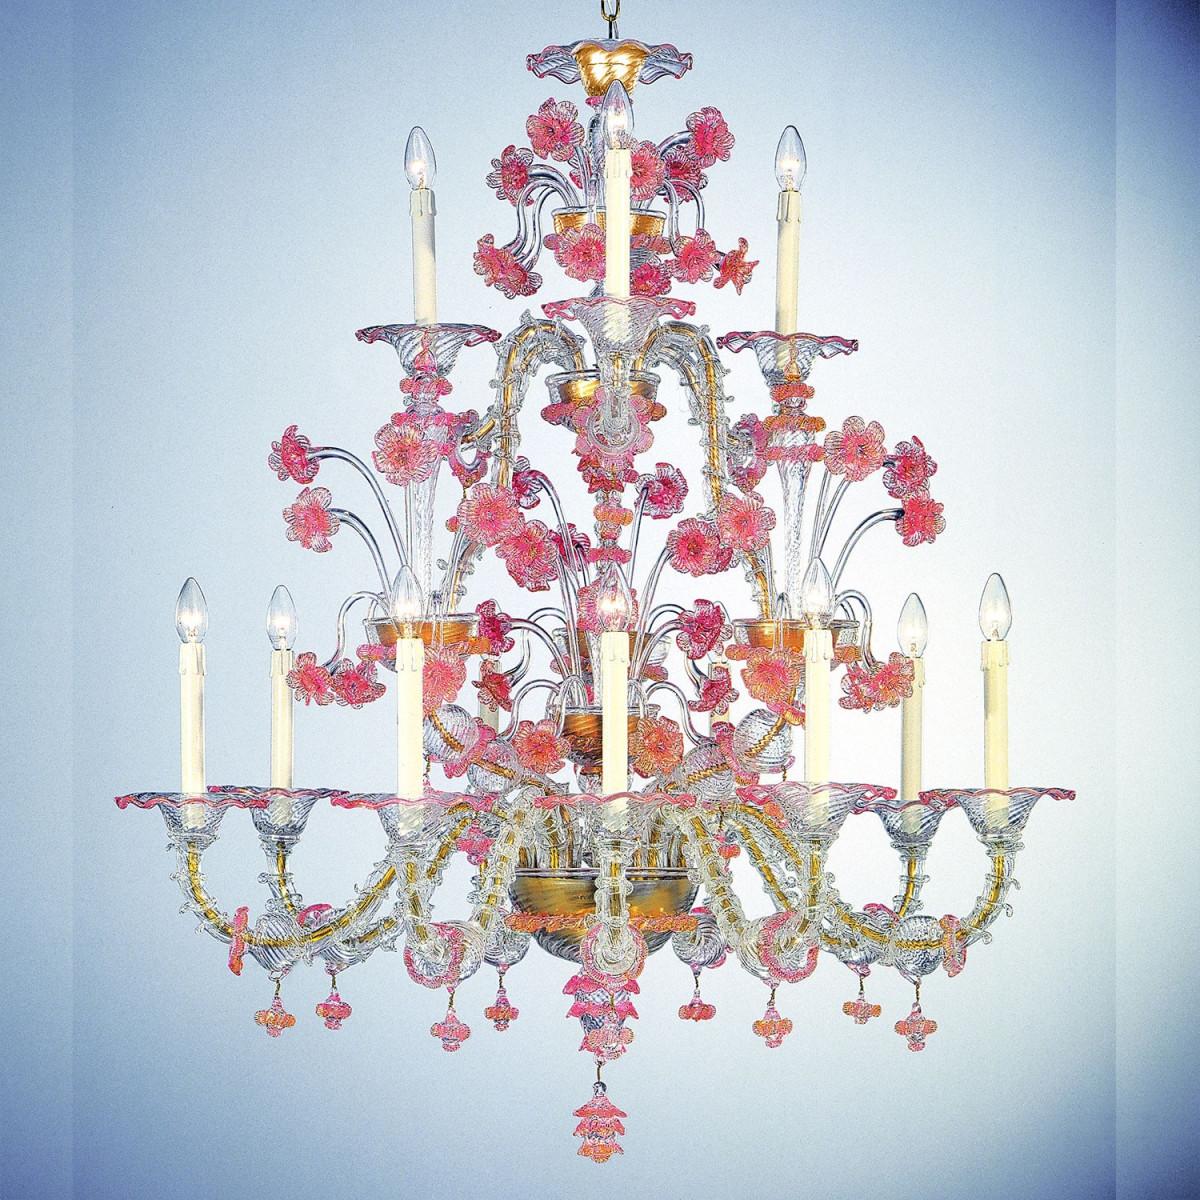 """Cloris"" araña de cristal de Murano - 12 luces - transparente y rosa"